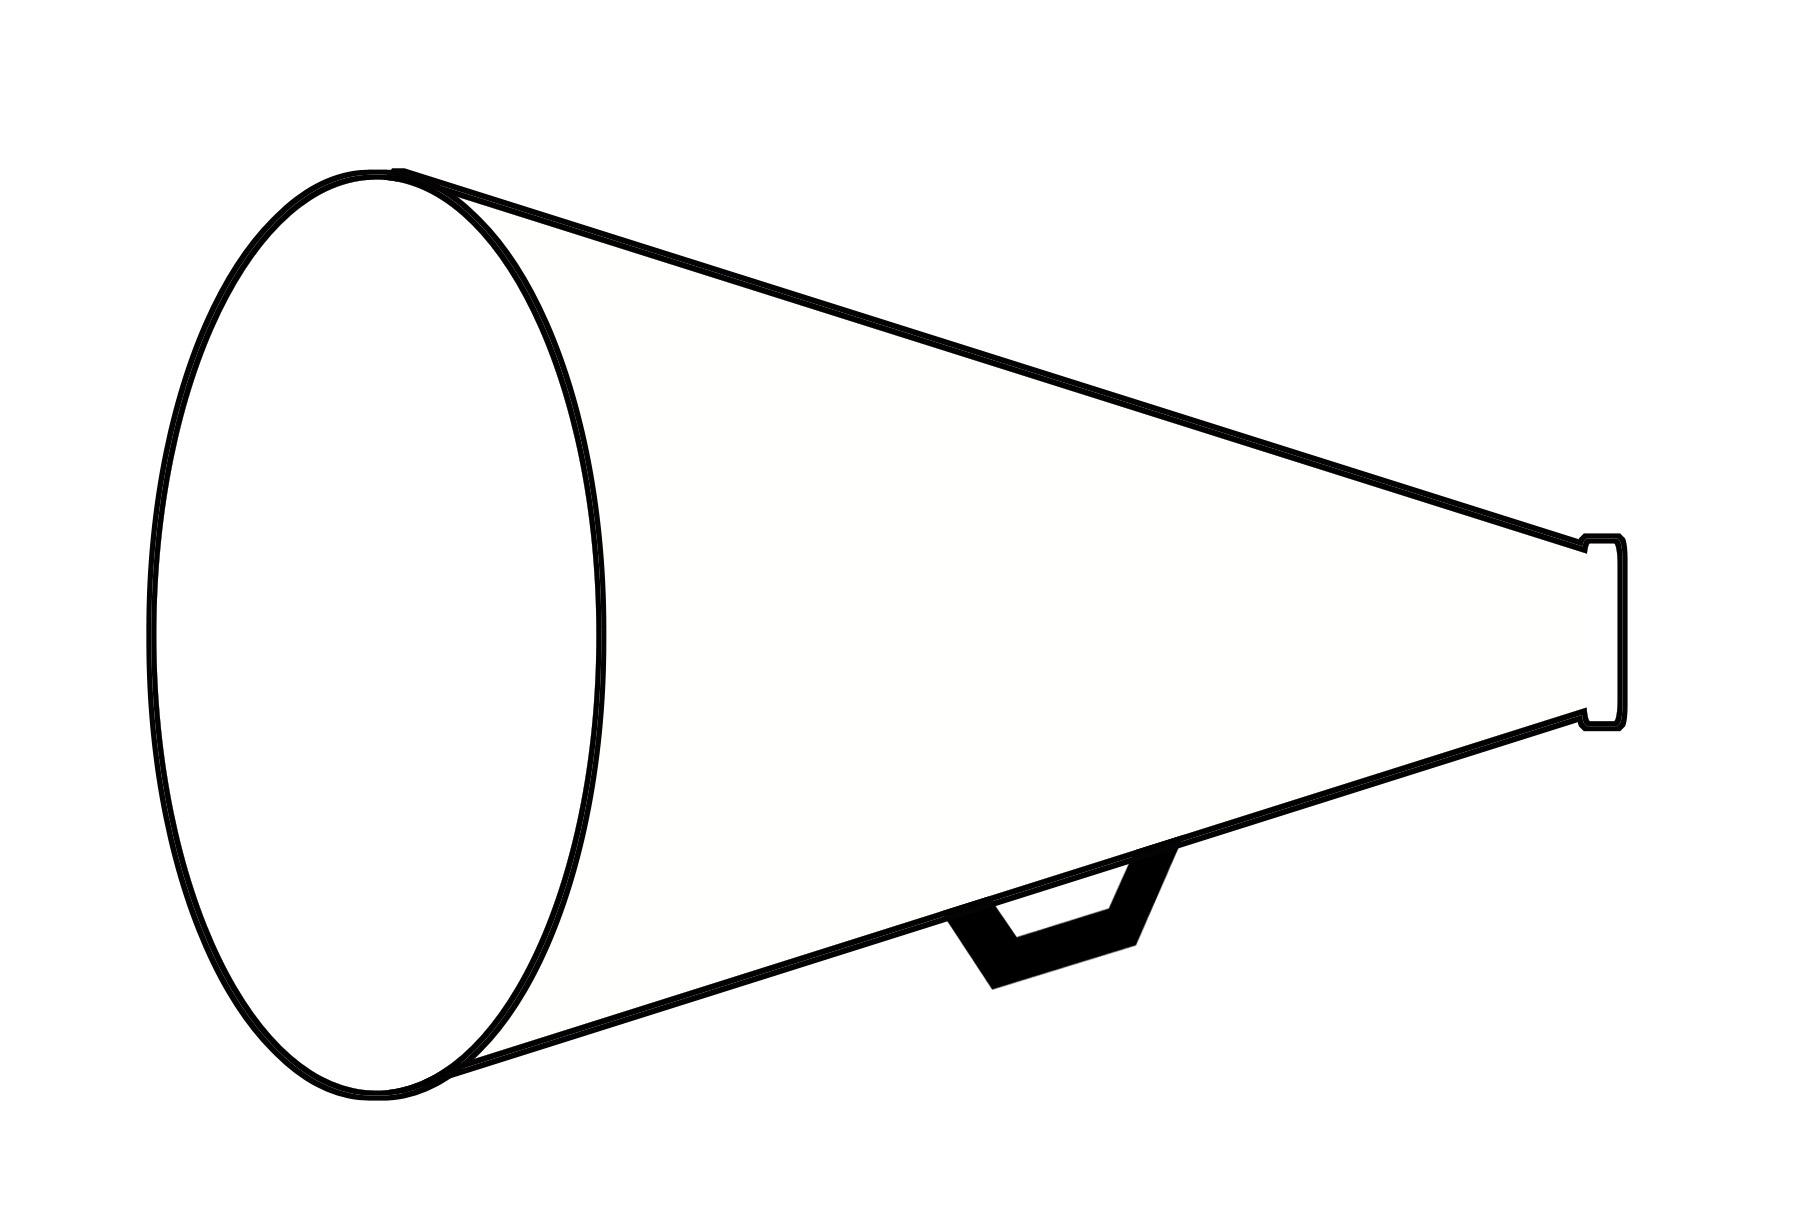 Free Cheerleader Cliparts Black Download Free Clip Art